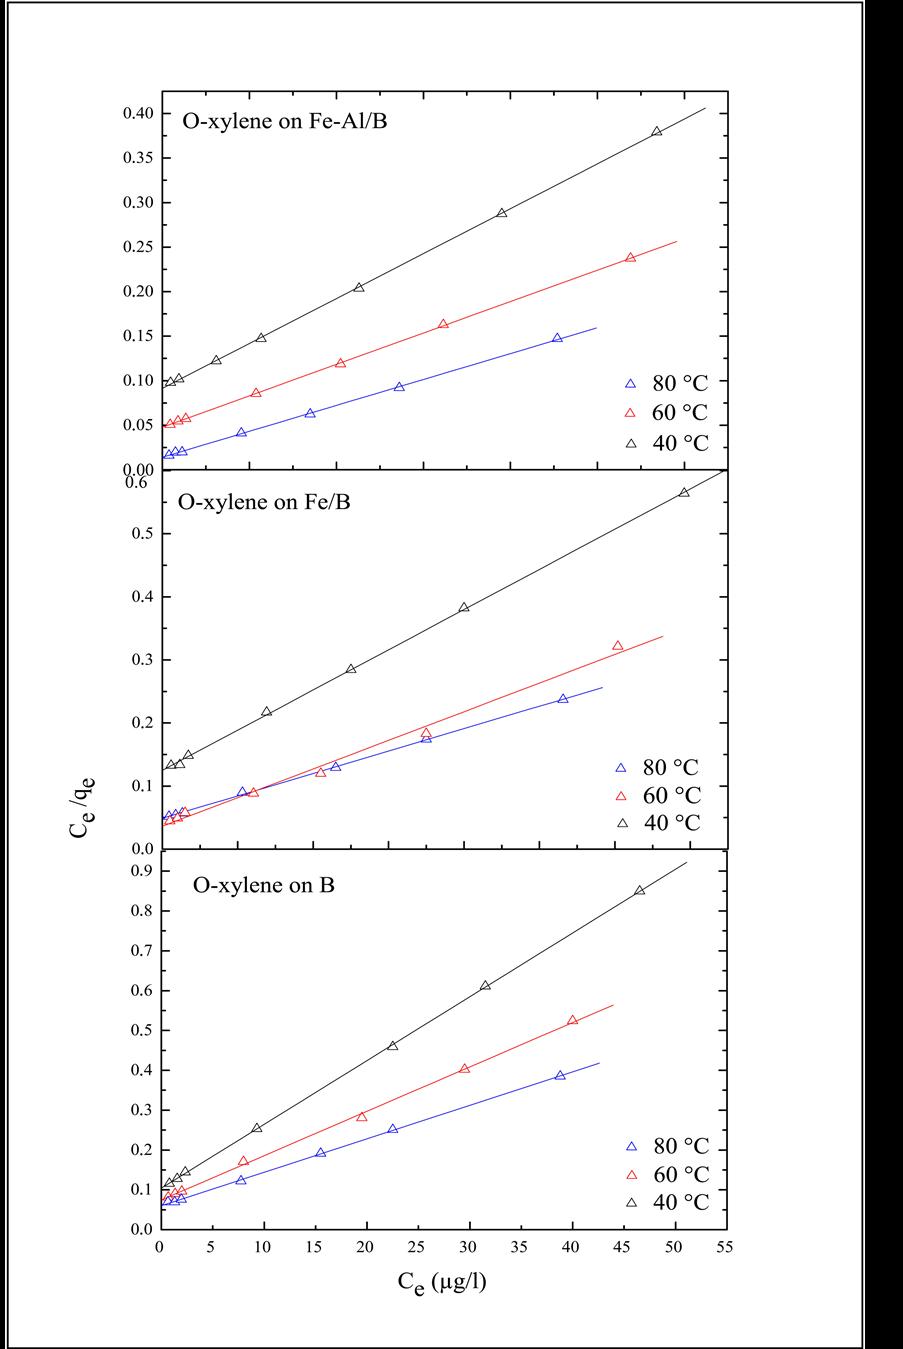 Adsorption-Desorption of BTX (Benzene, Toluene and O-xylene) on Fe